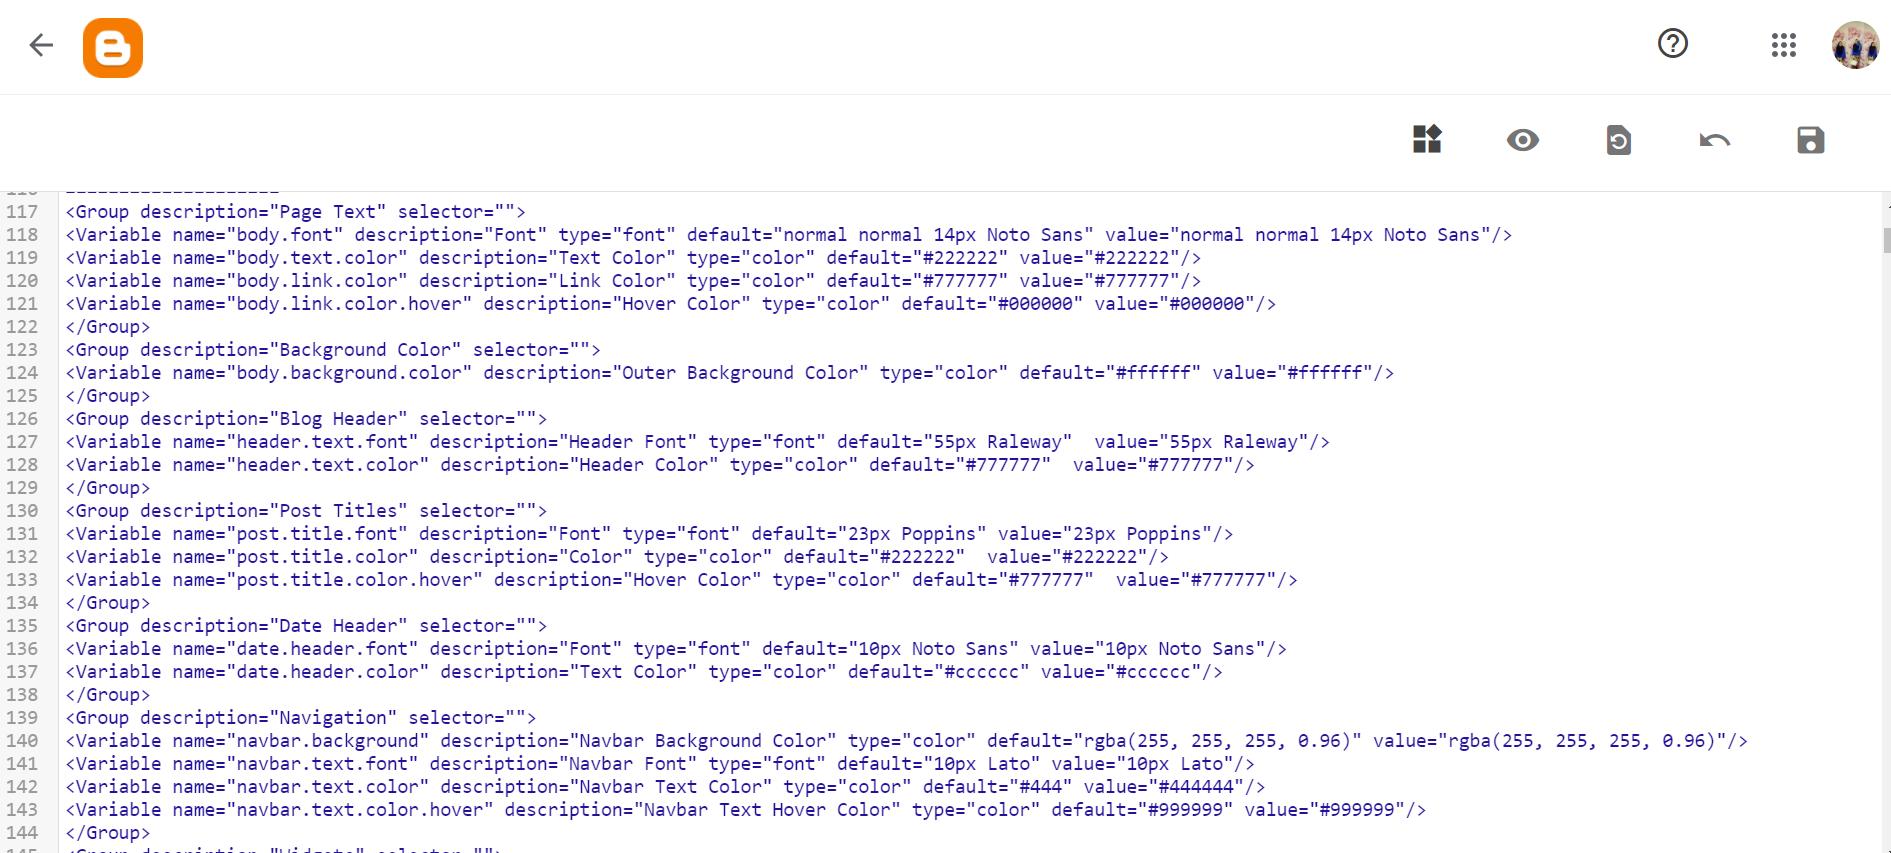 cara nak edit coding blogger - mesra seo - byfarahh.com